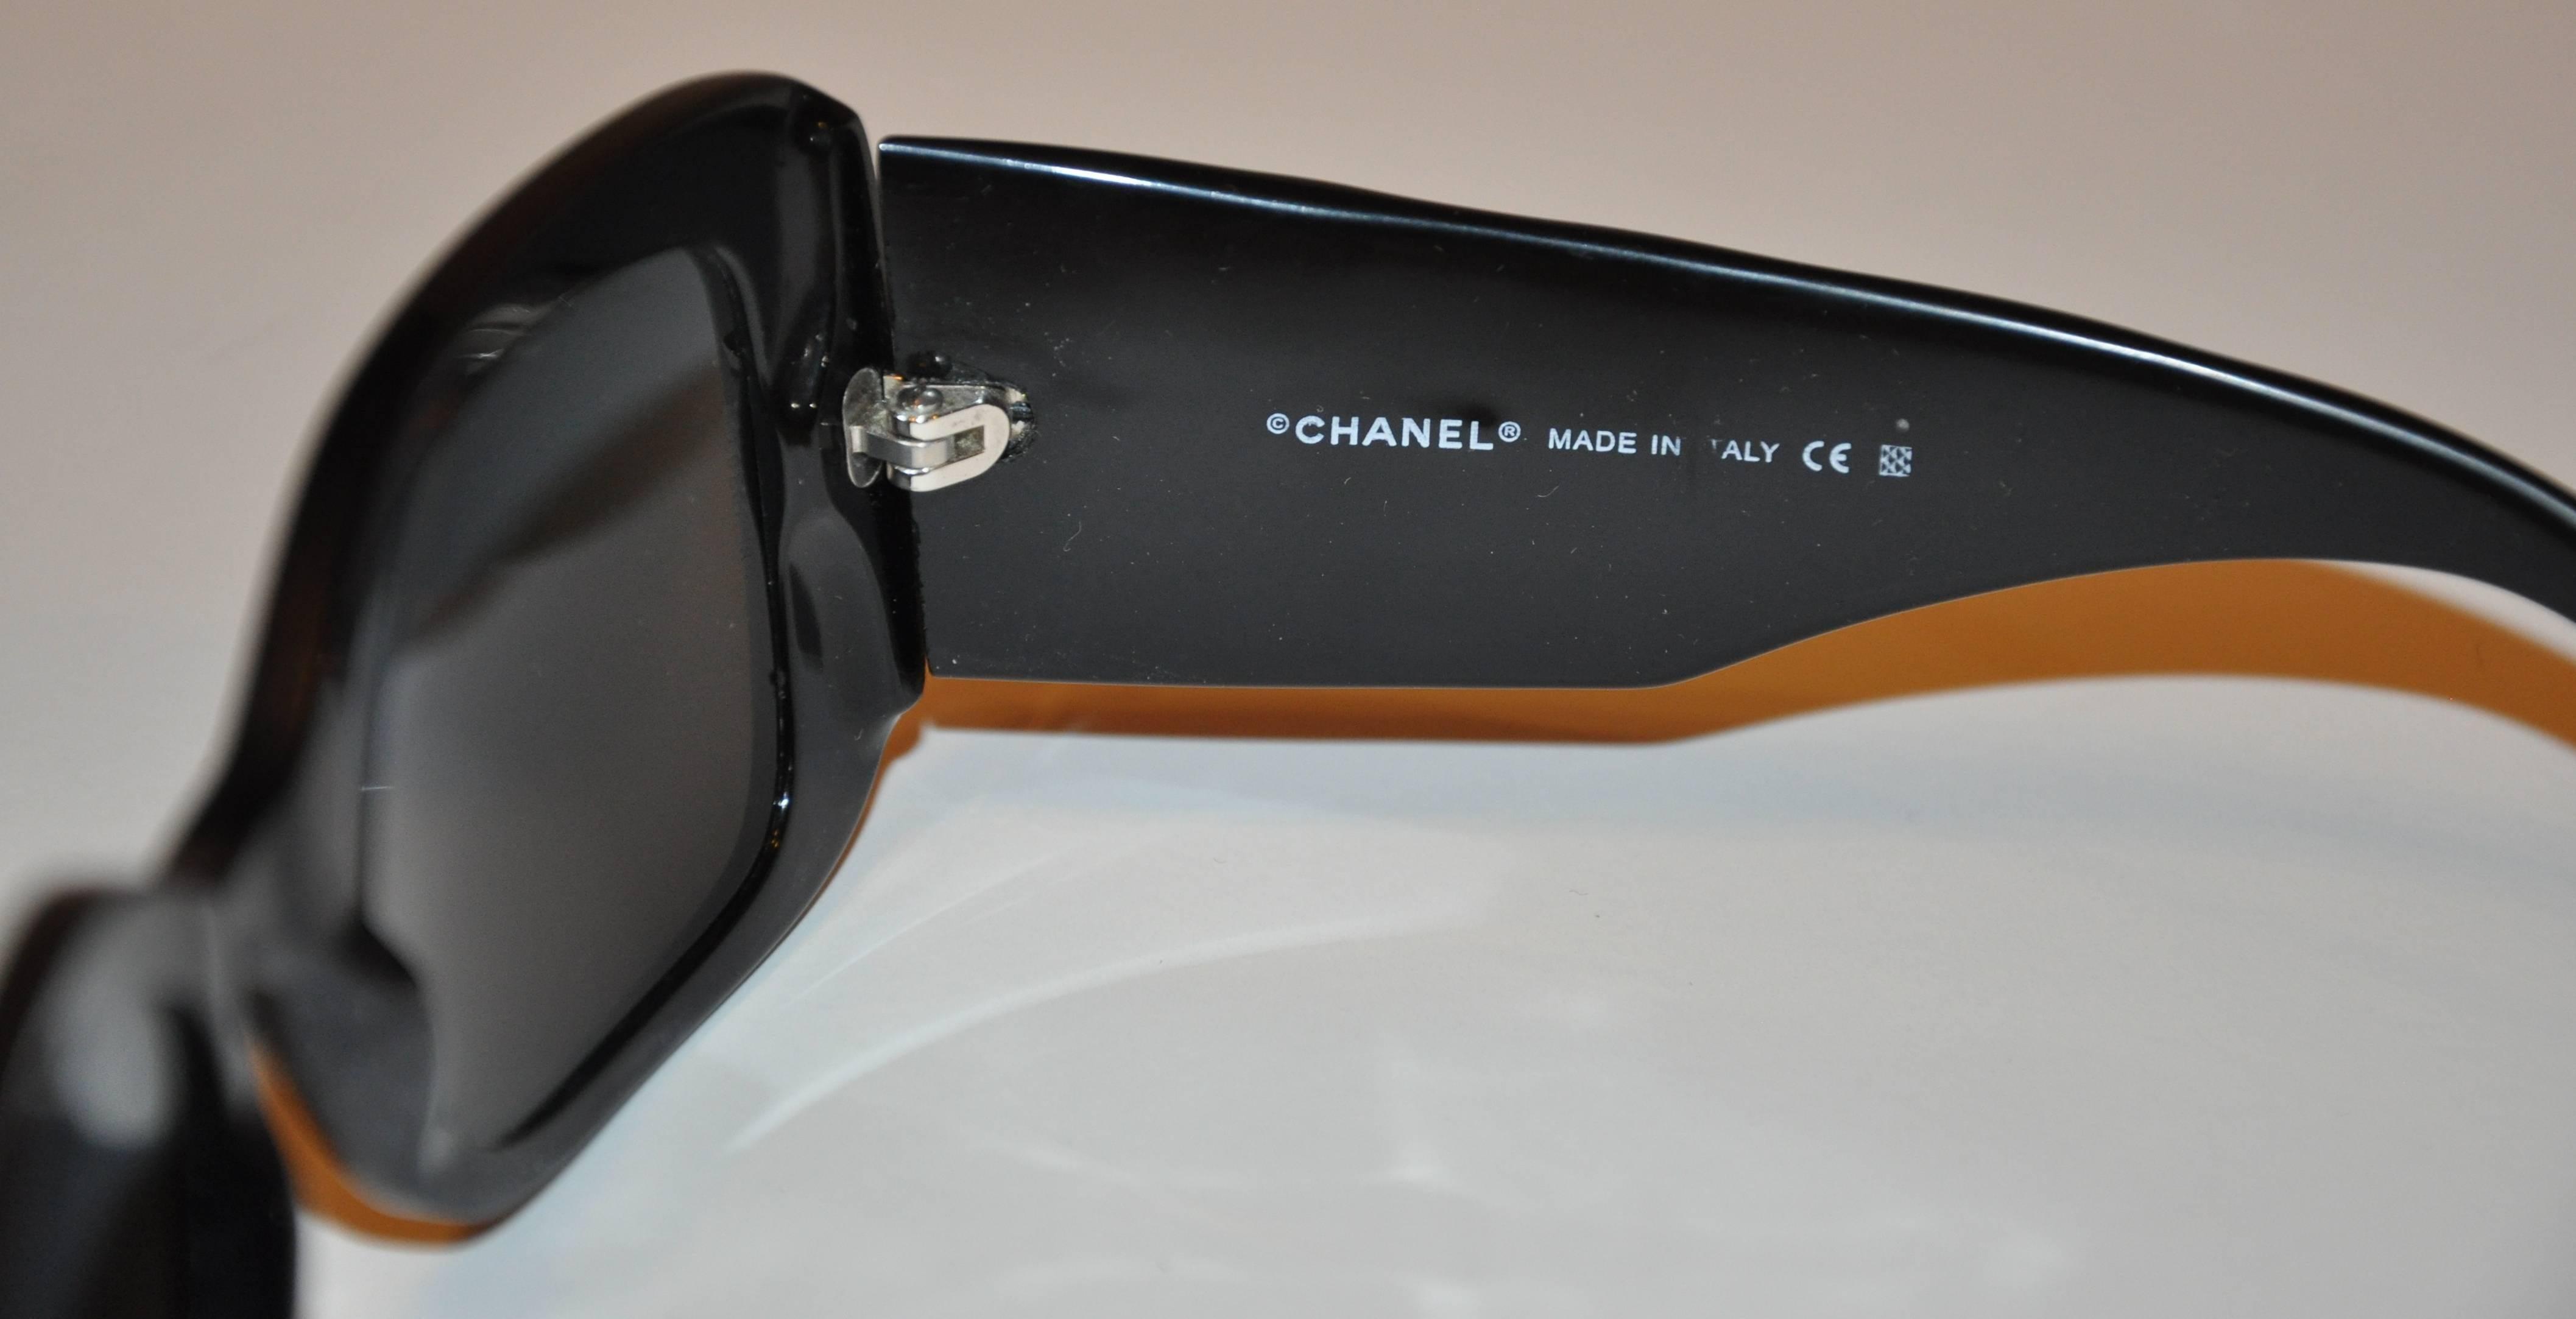 1b1c3d81f4a1 Chanel Ladies Sunglasses Uk - Restaurant and Palinka Bar